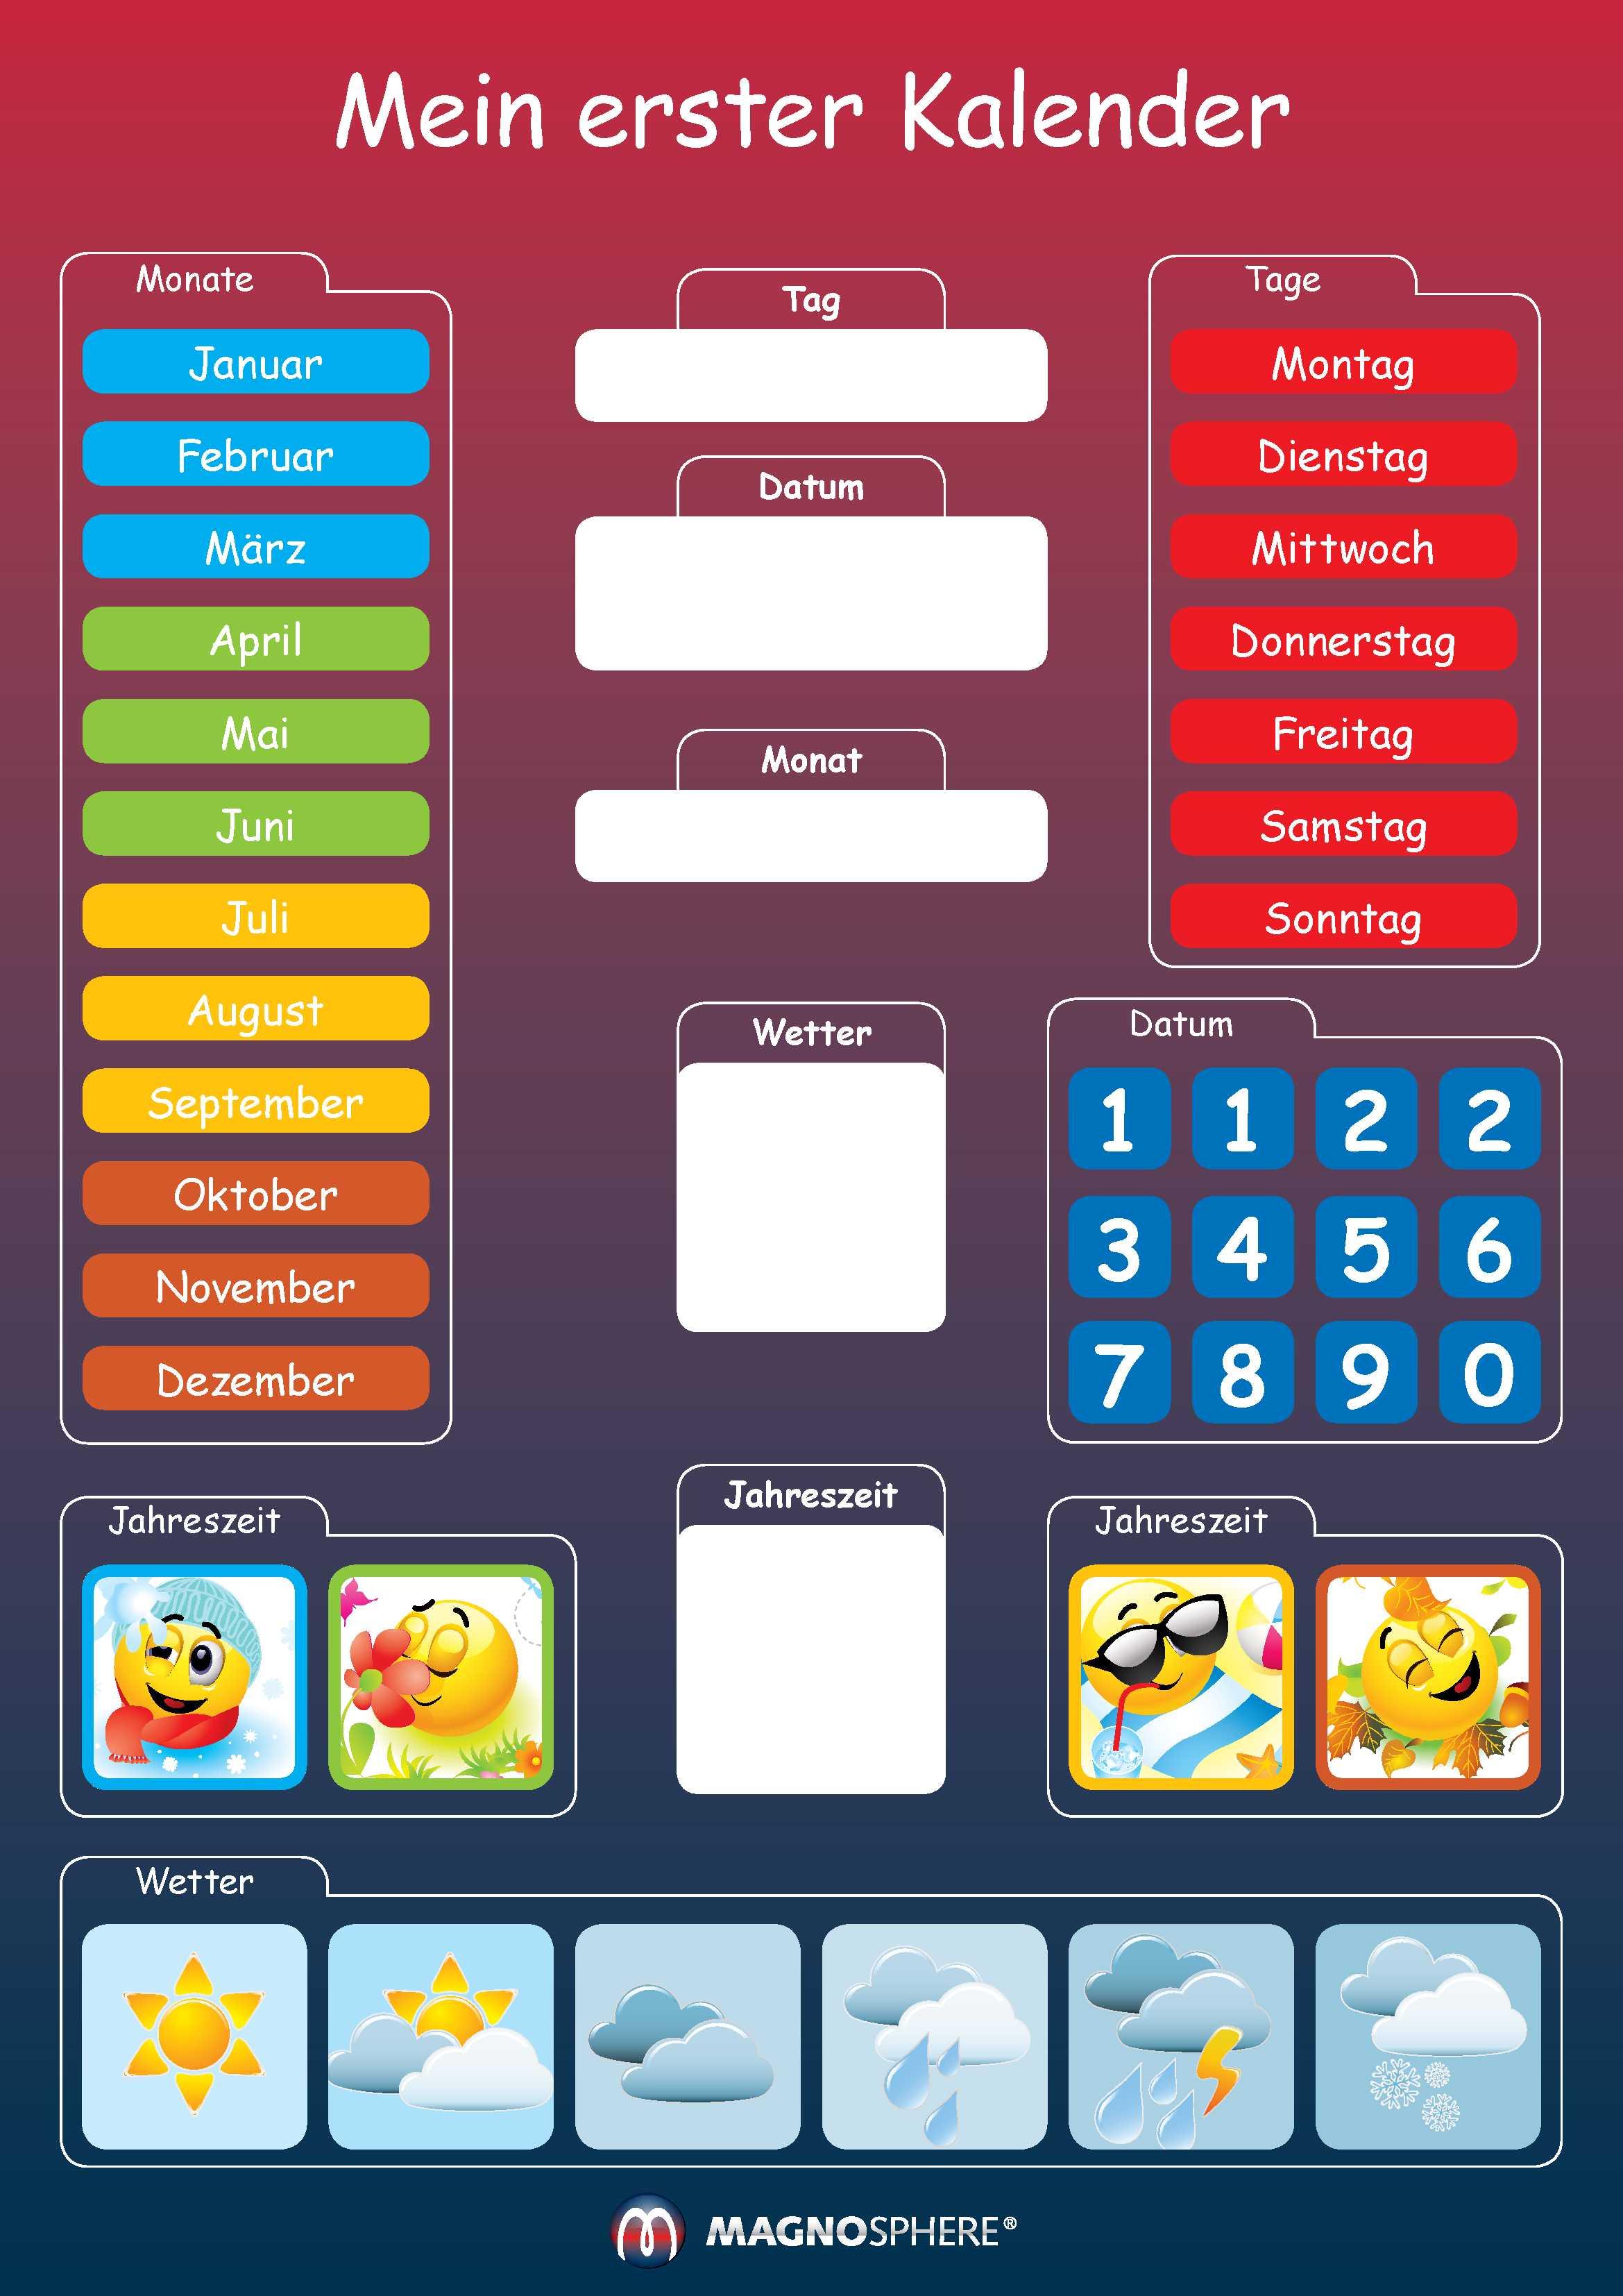 Kids Magnetic Calendar, My First Learning Calendar DIN A3 - 29,7 x 42 cm, 41 pcs